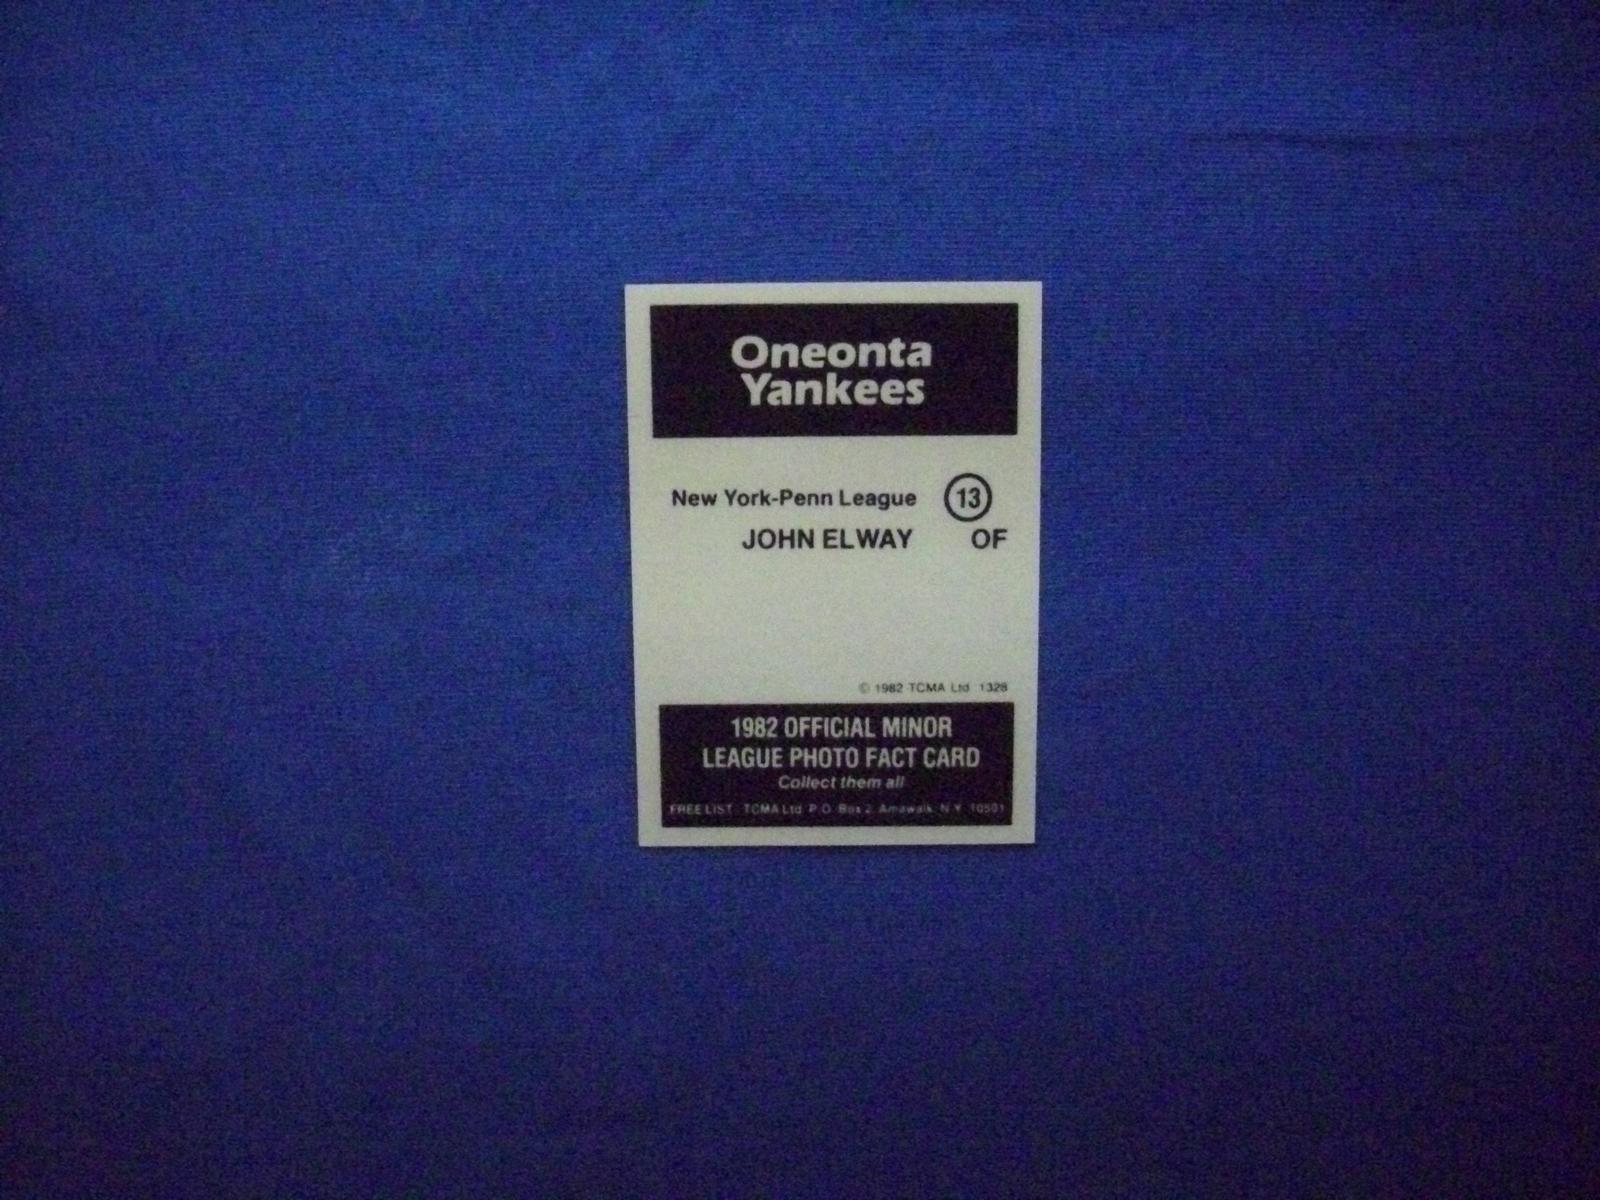 1982 TCMA Baseball #13 John Elway [Oneonta Yankees] Rookie Reprint